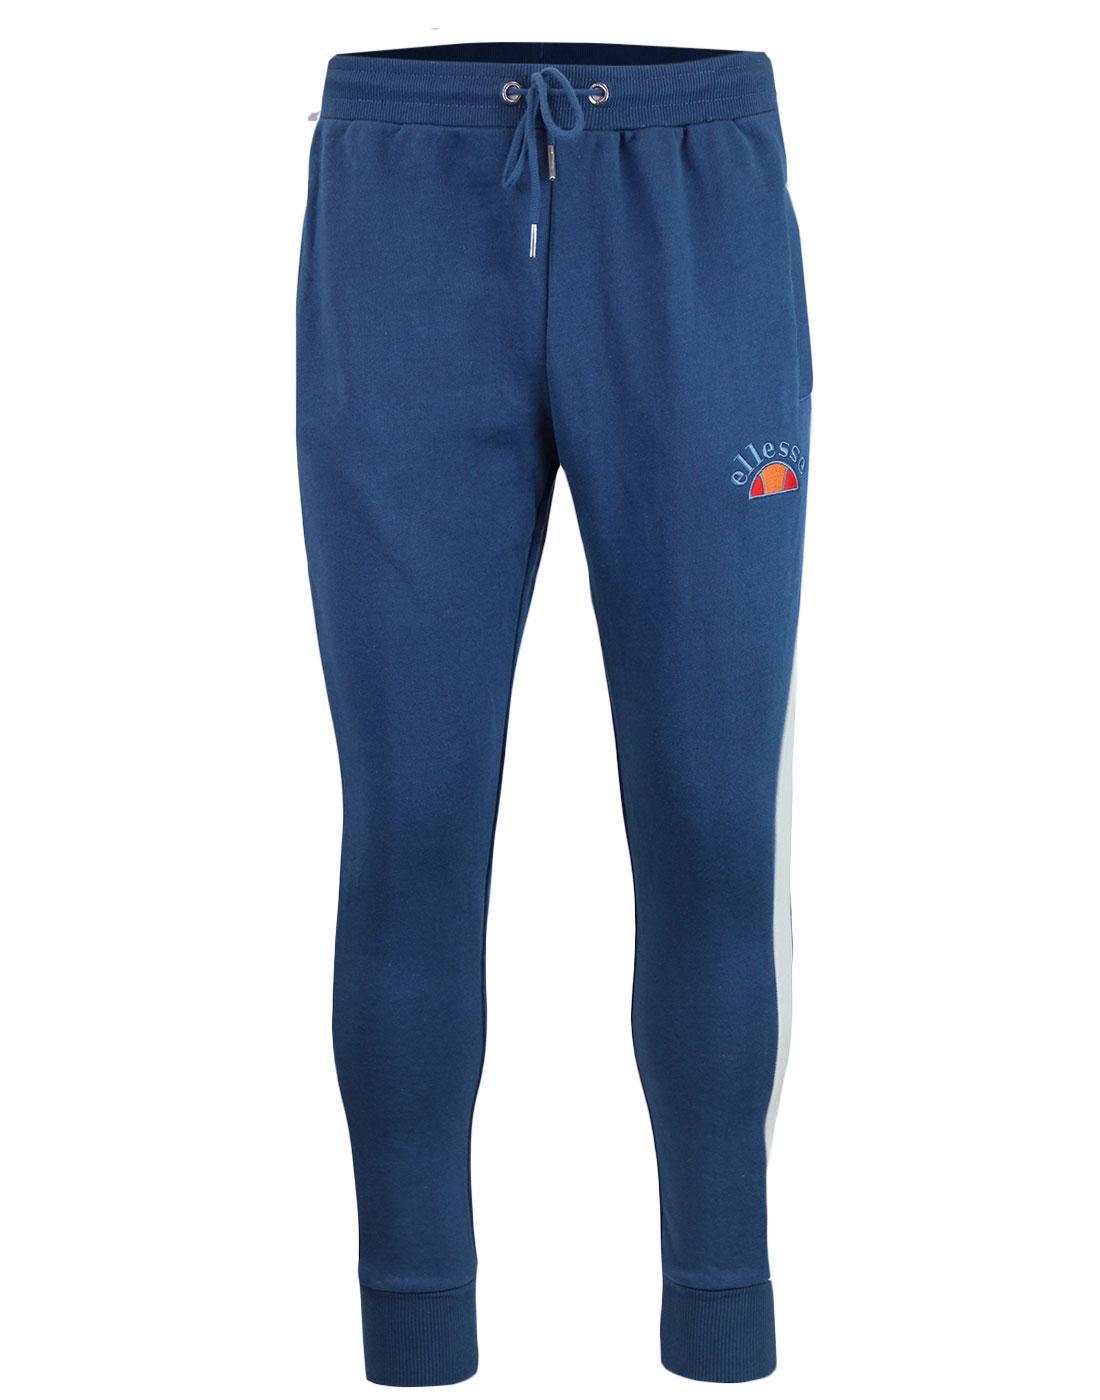 Livio ELLESSE Men's Retro 80s Jersey Jogger Pants